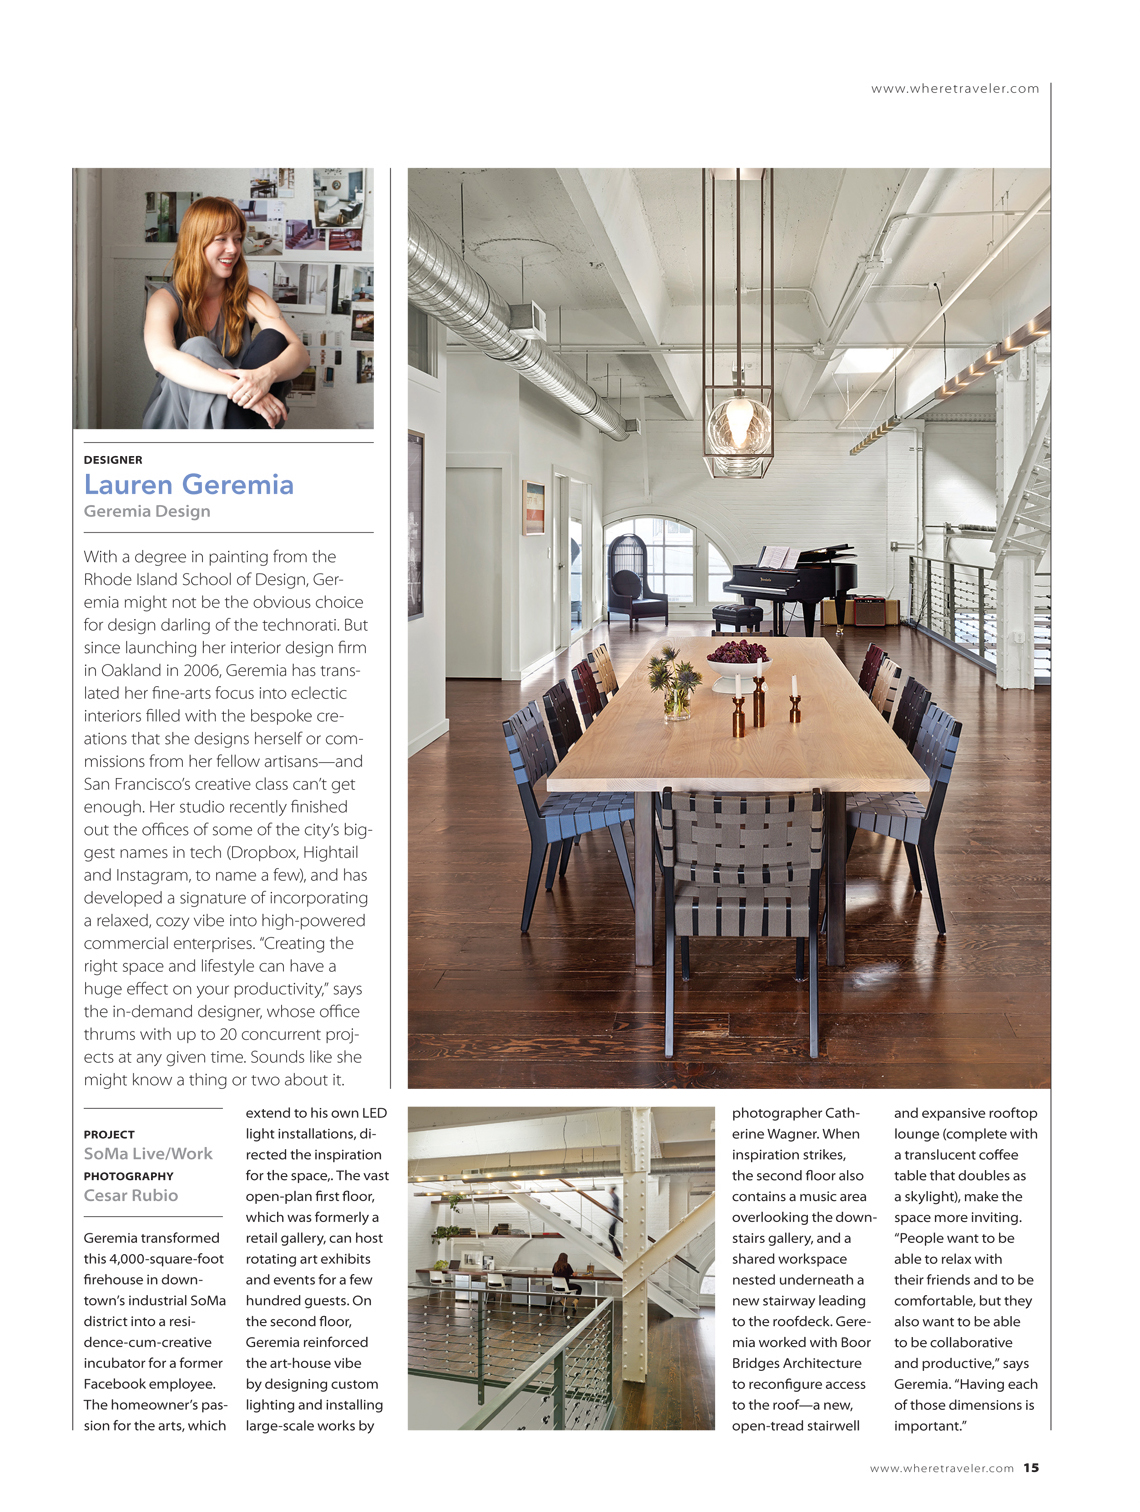 Where Magazine Soma Loft As Seen in Where Magazine: Our SOMA Loft